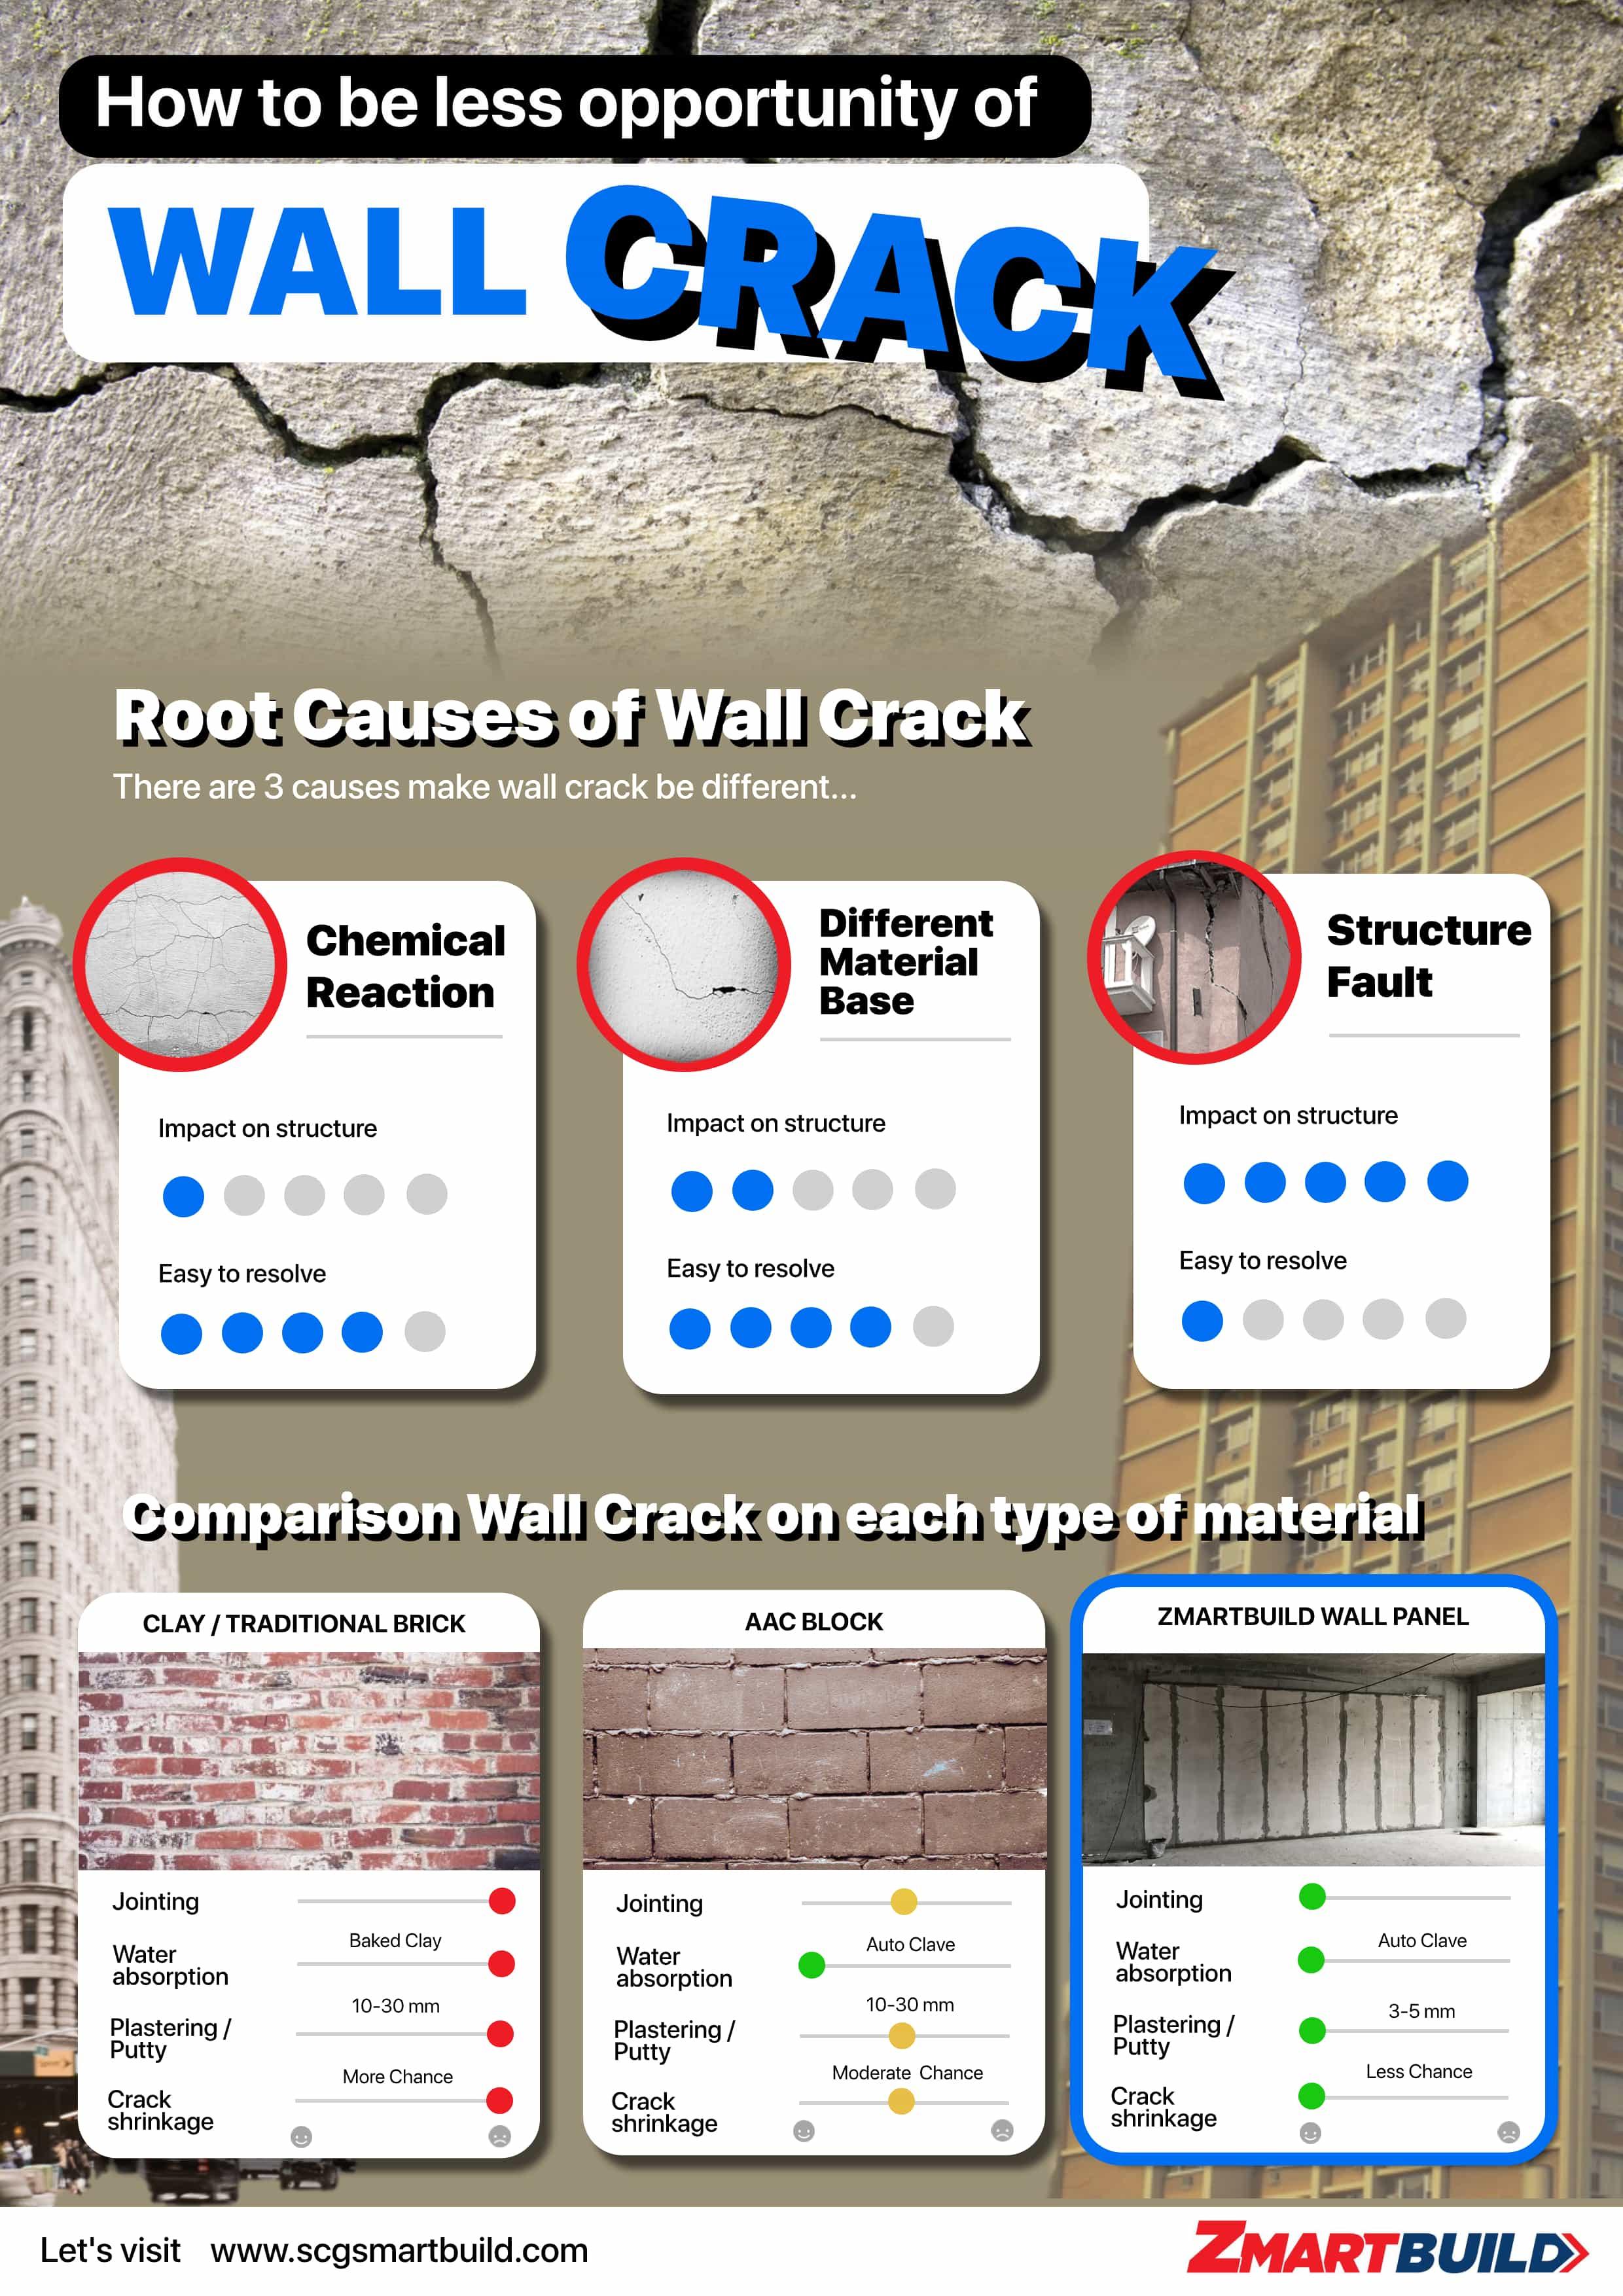 Wall Crack Problem Infographic by Zmartbuild